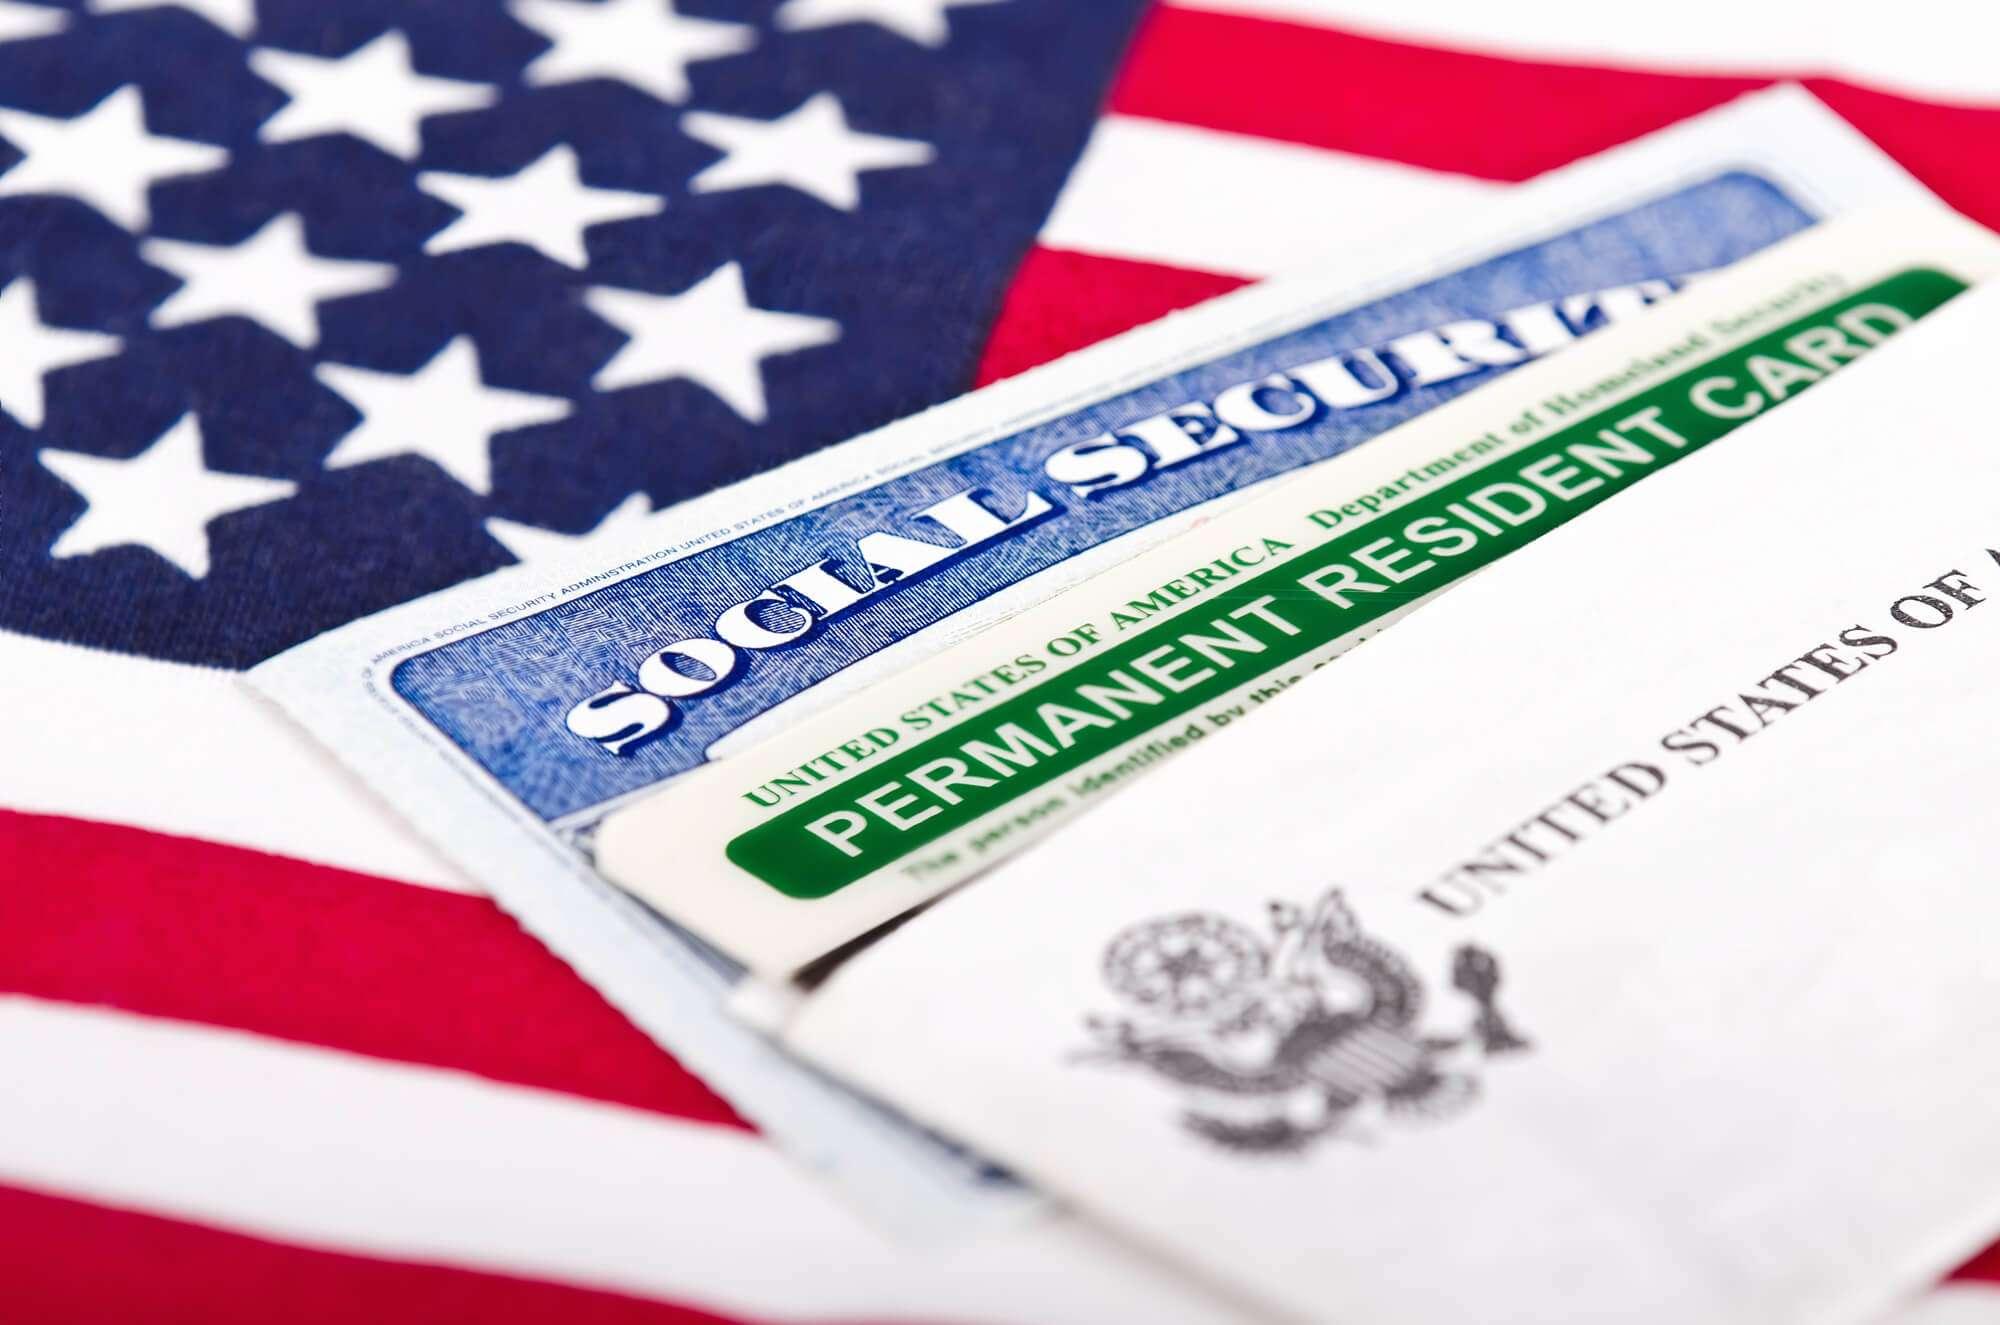 Afinal, o que é o Green Card? Veja como conseguir o seu!